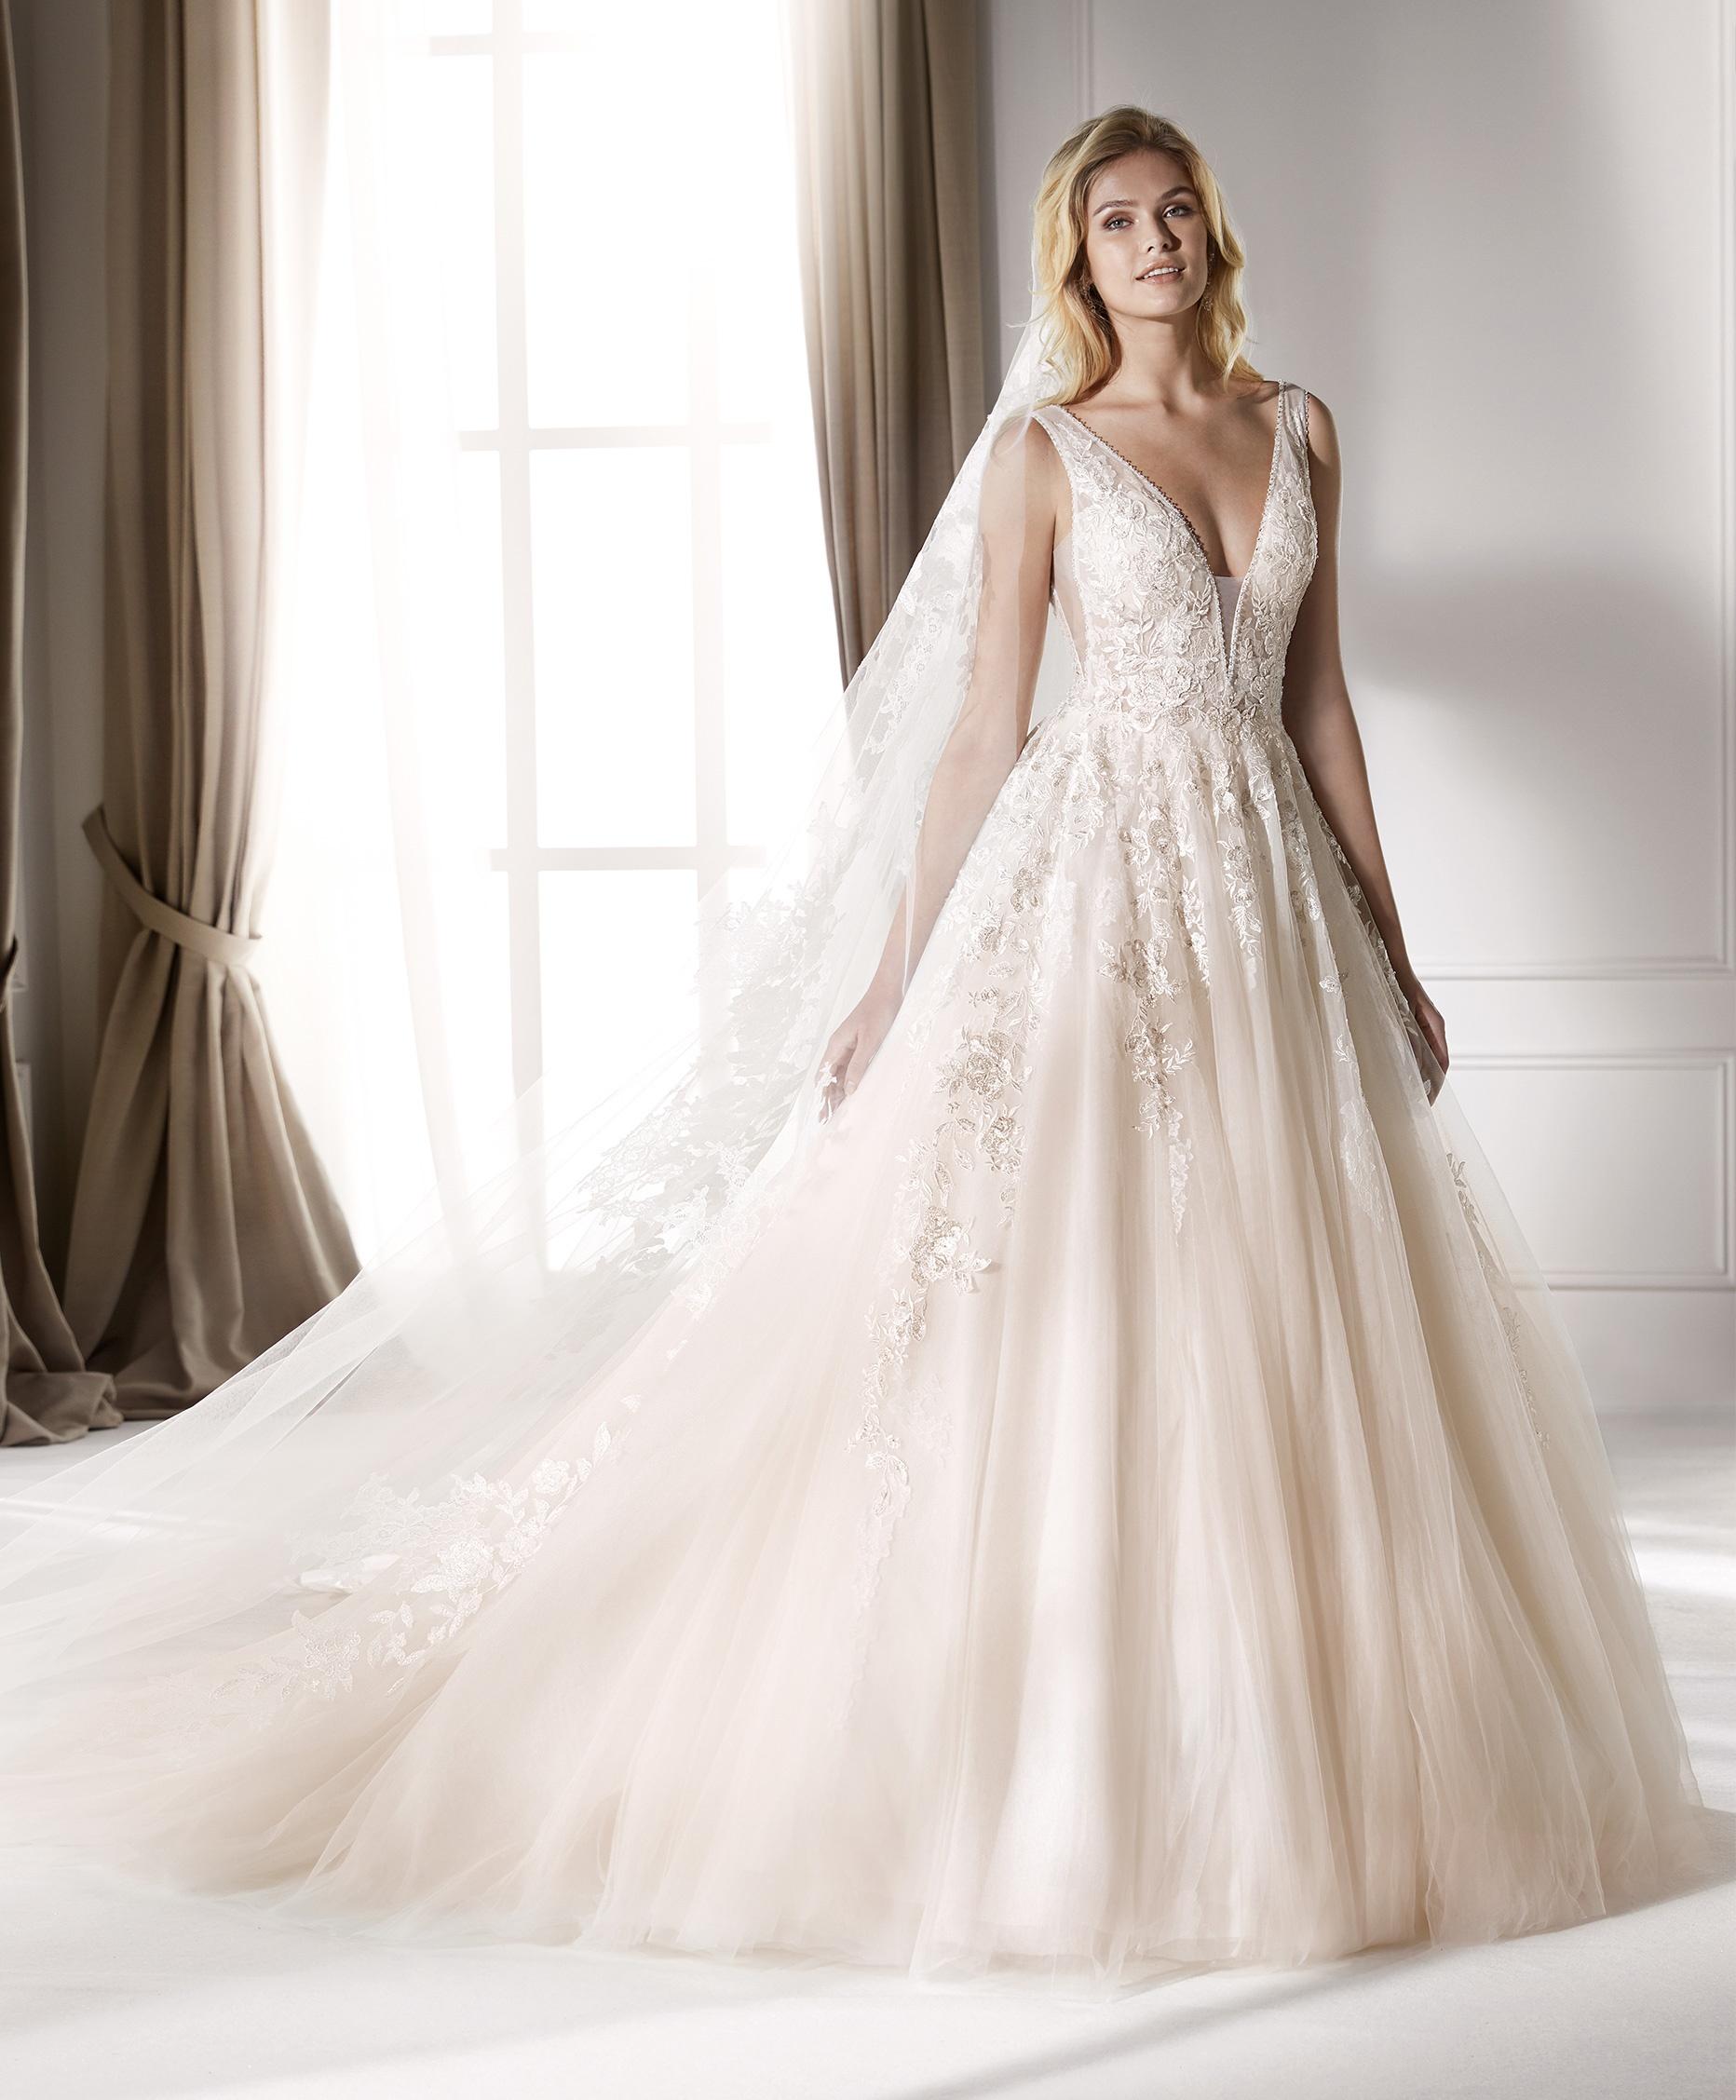 nicole-spose-NIA20221-Nicole-moda-sposa-2020-81.jpg